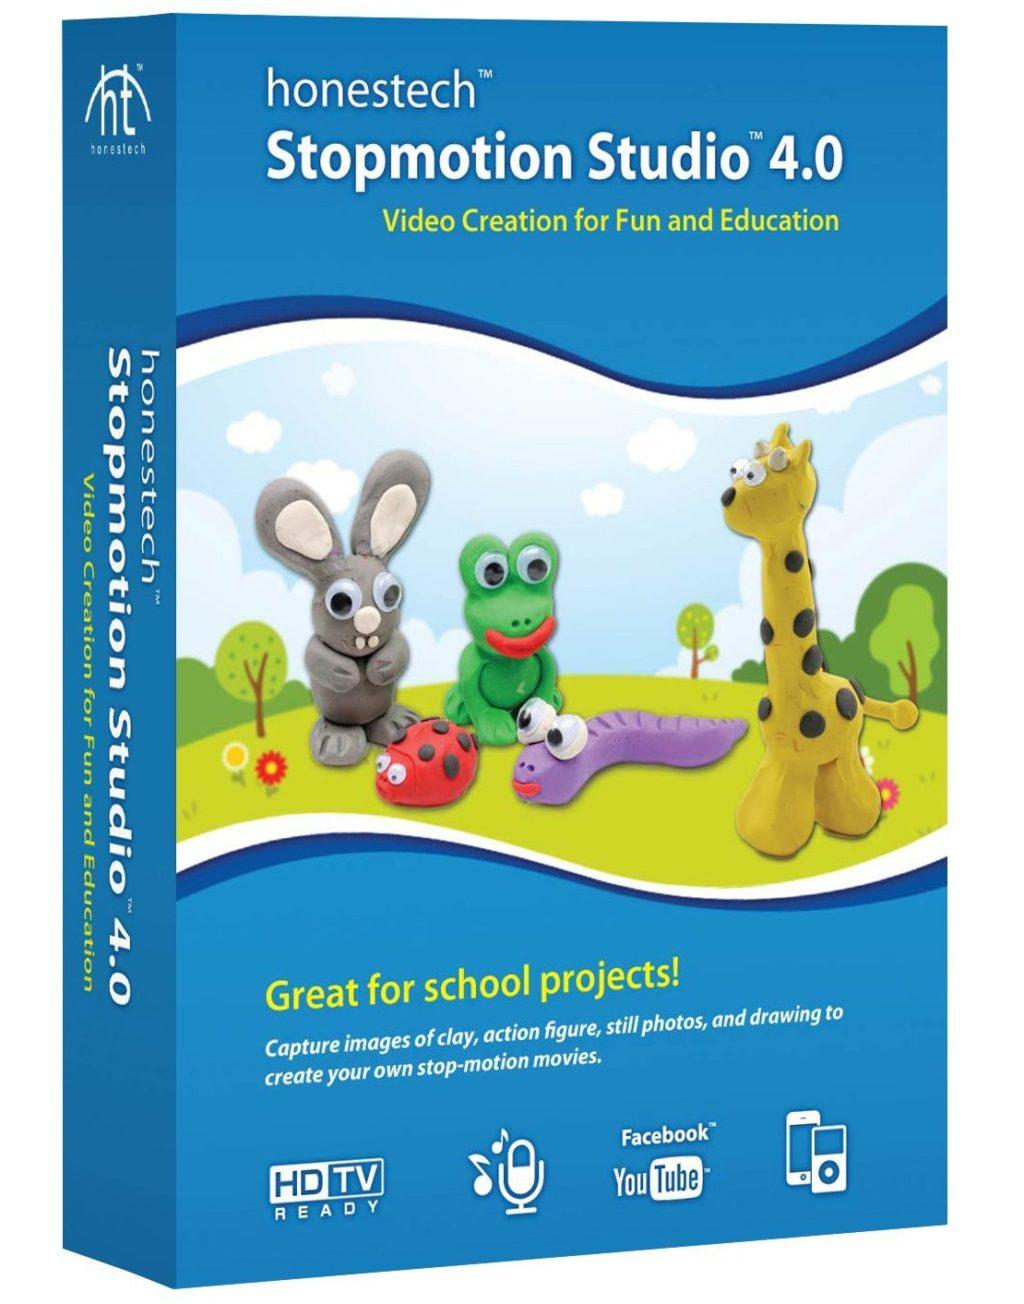 VIDBOX Stopmotion Studio 4.0 - stop motion animation kits